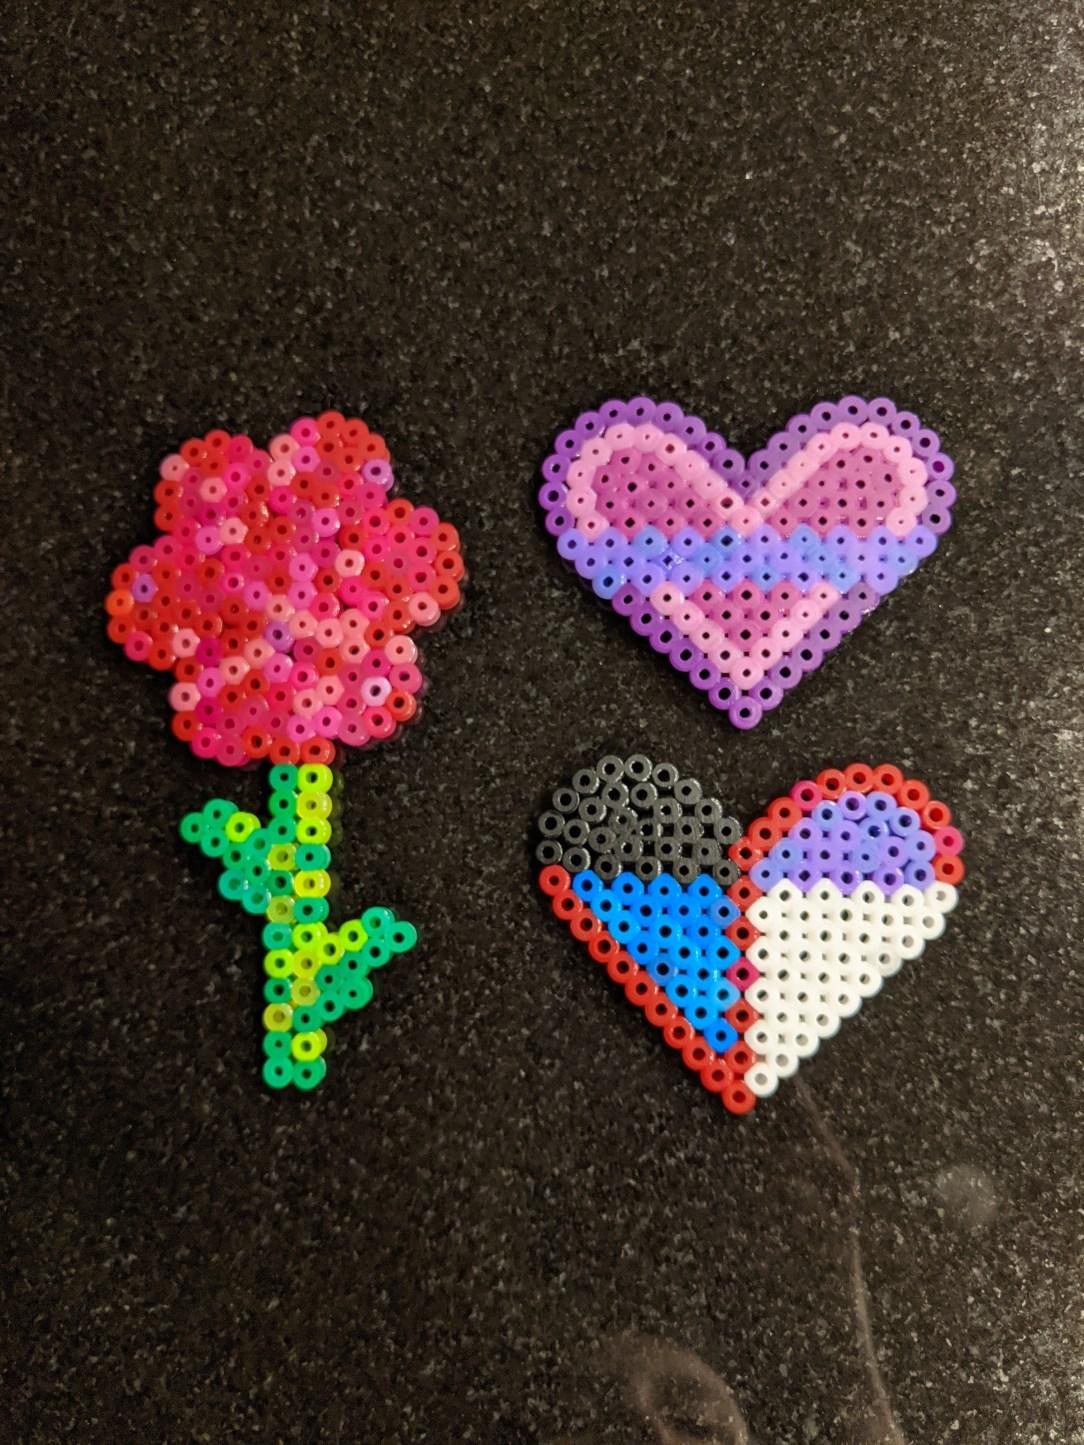 iron-bead-art-crafts-quarantine-activities